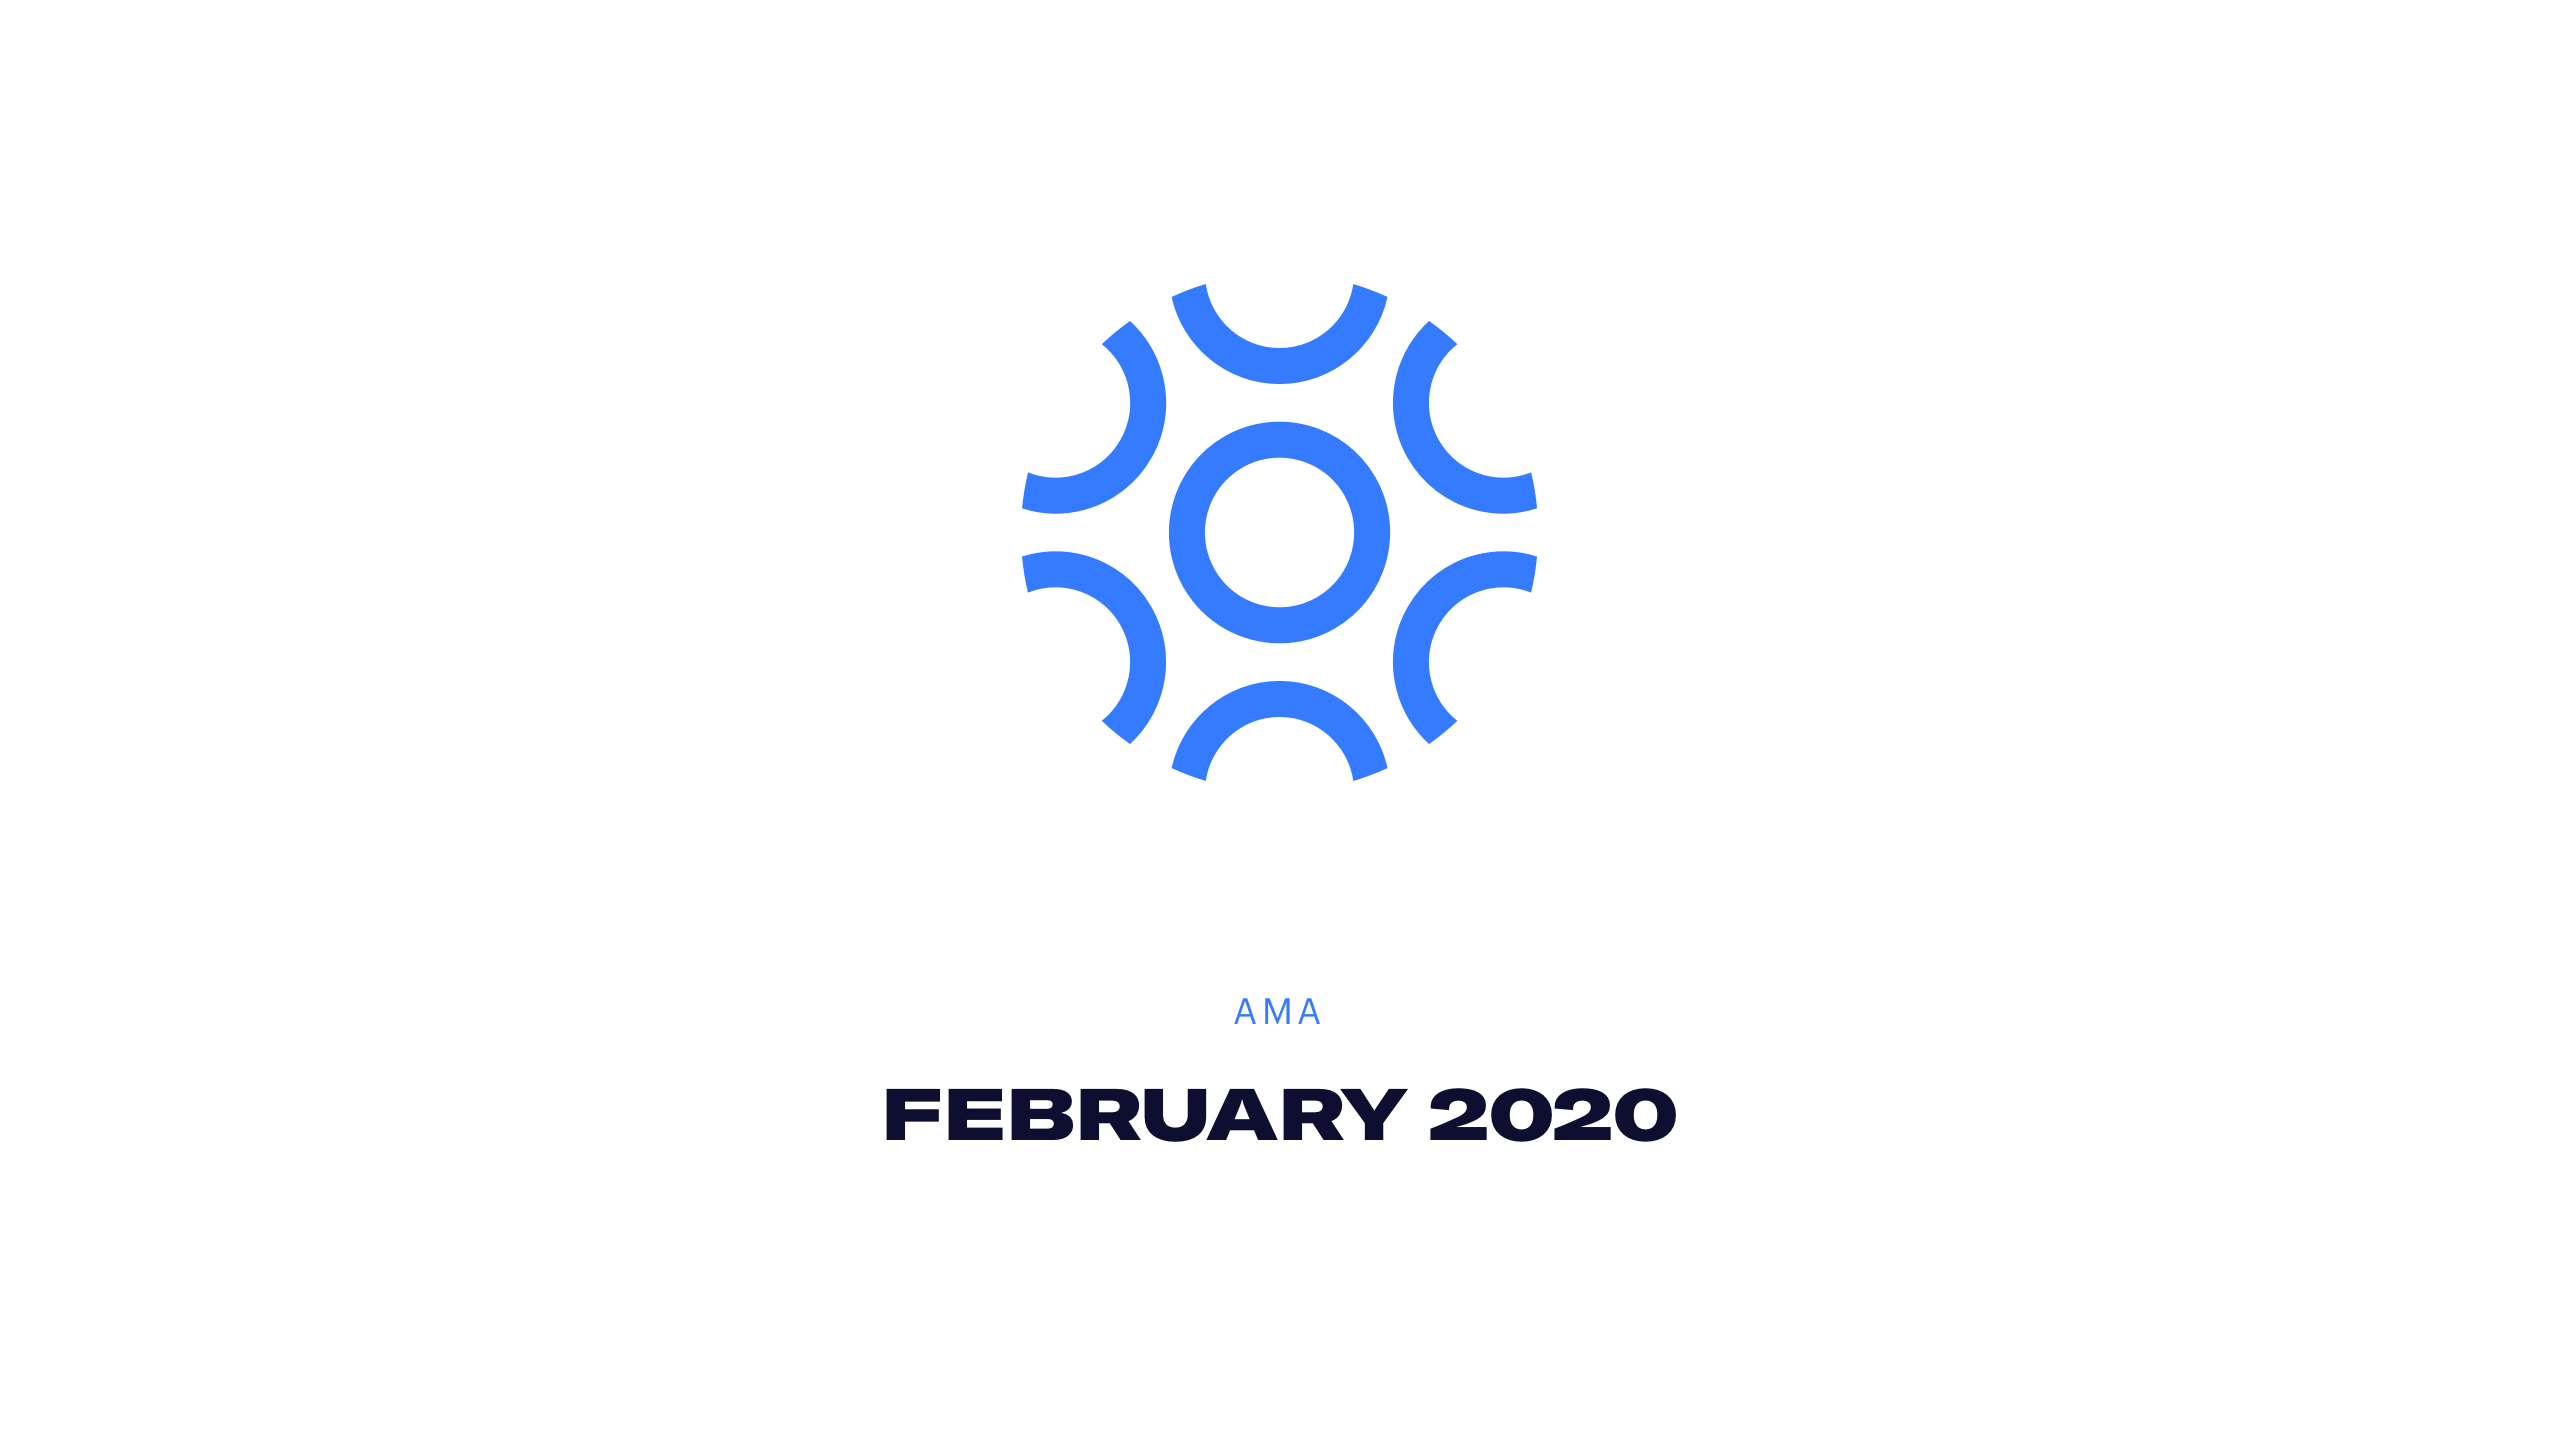 AMA - February 2020